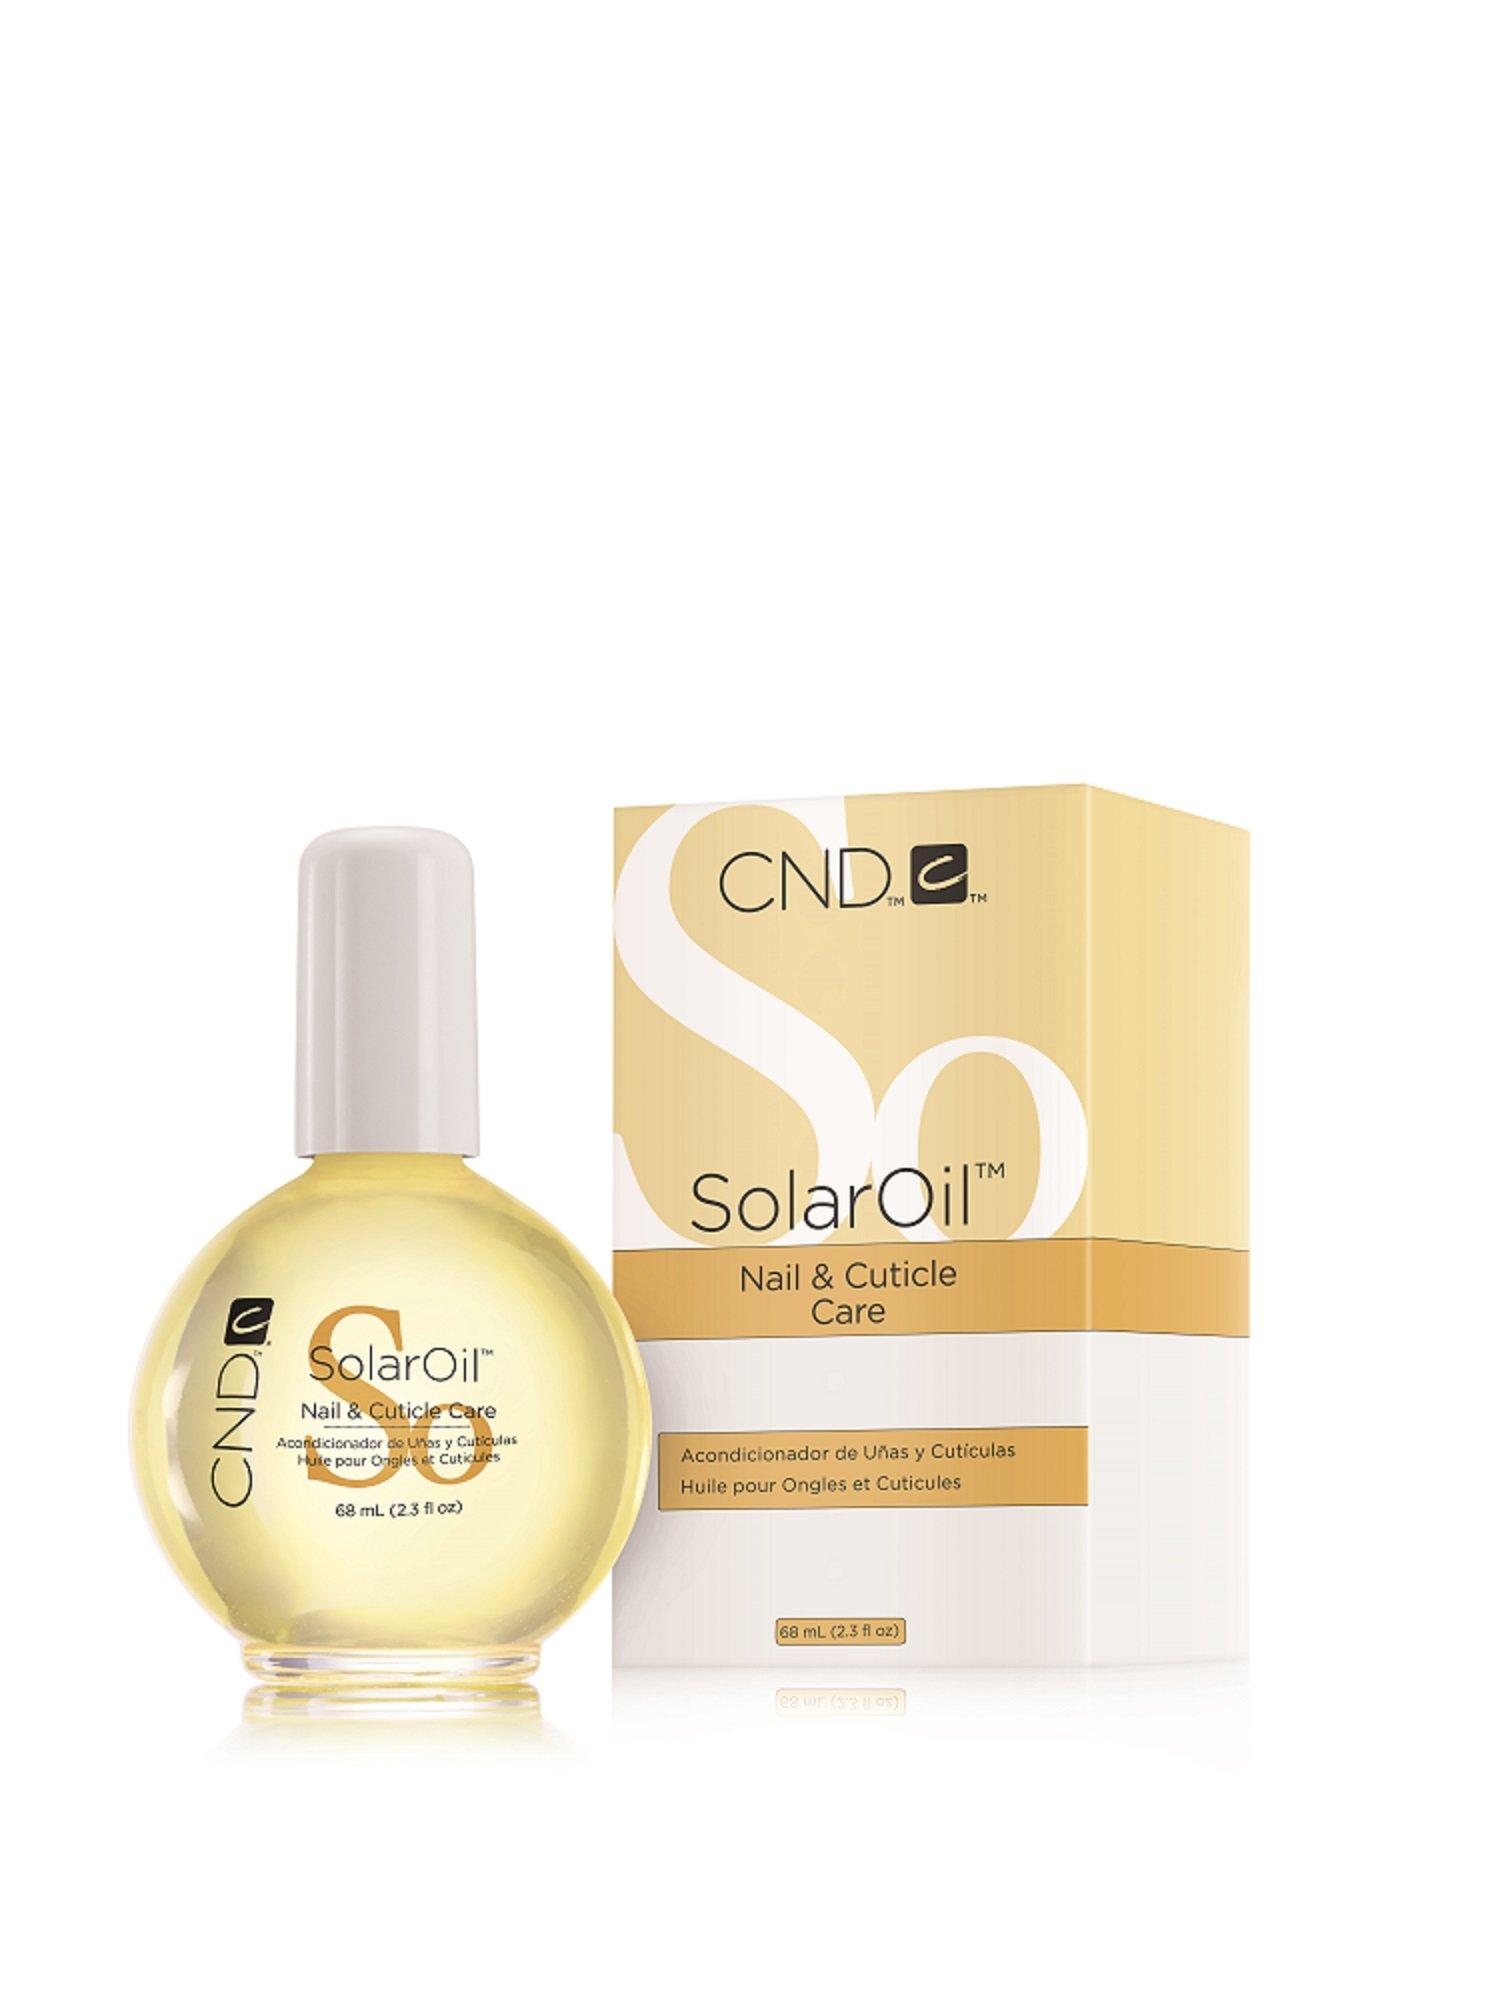 CND Solaroil, 2.3 oz.